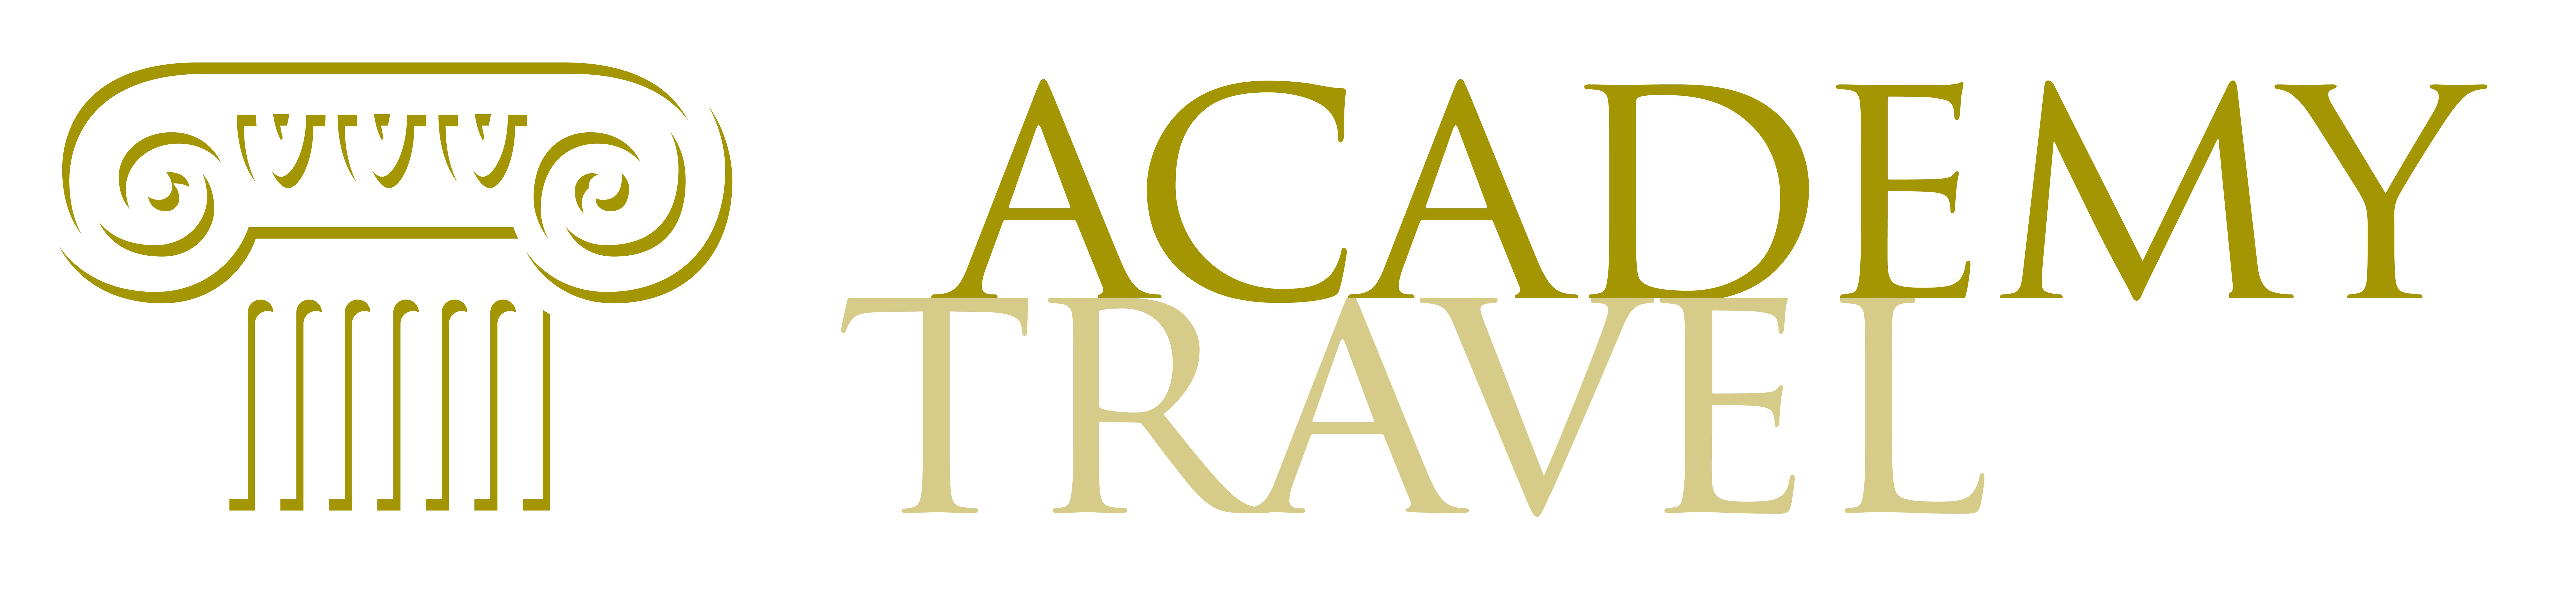 Academy Travel